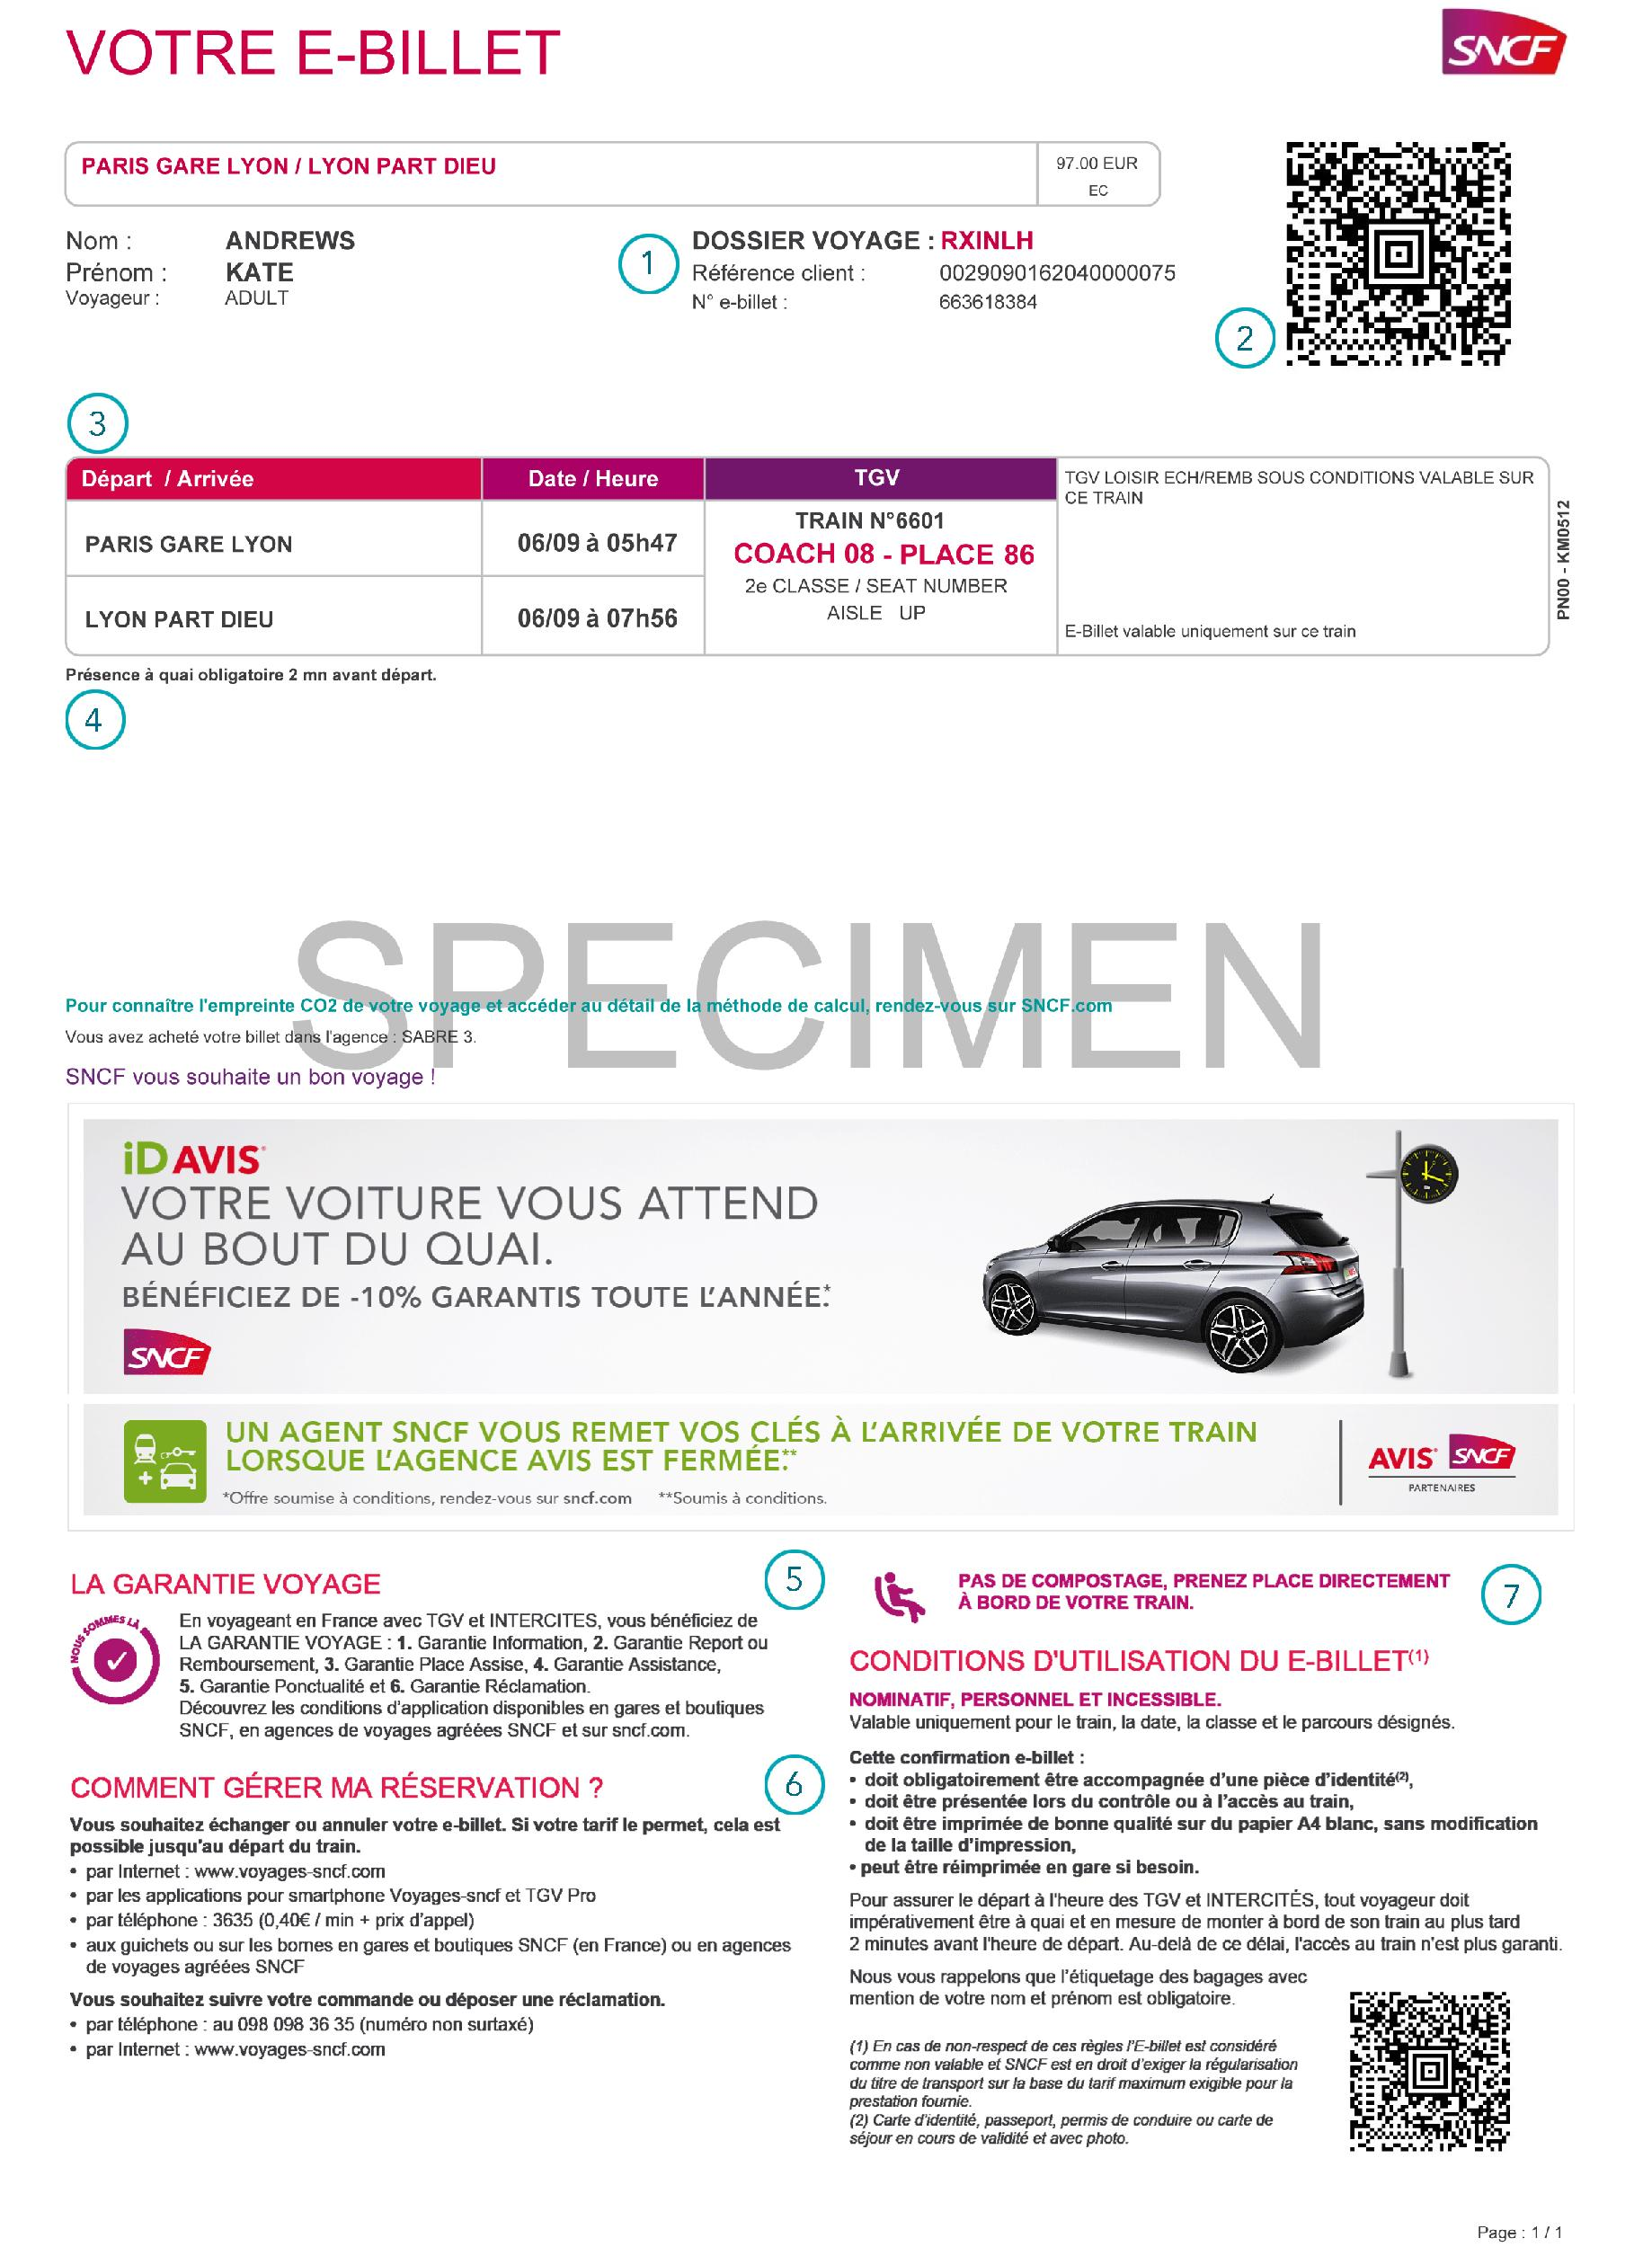 Understanding your French train ticket - Loco2 Help